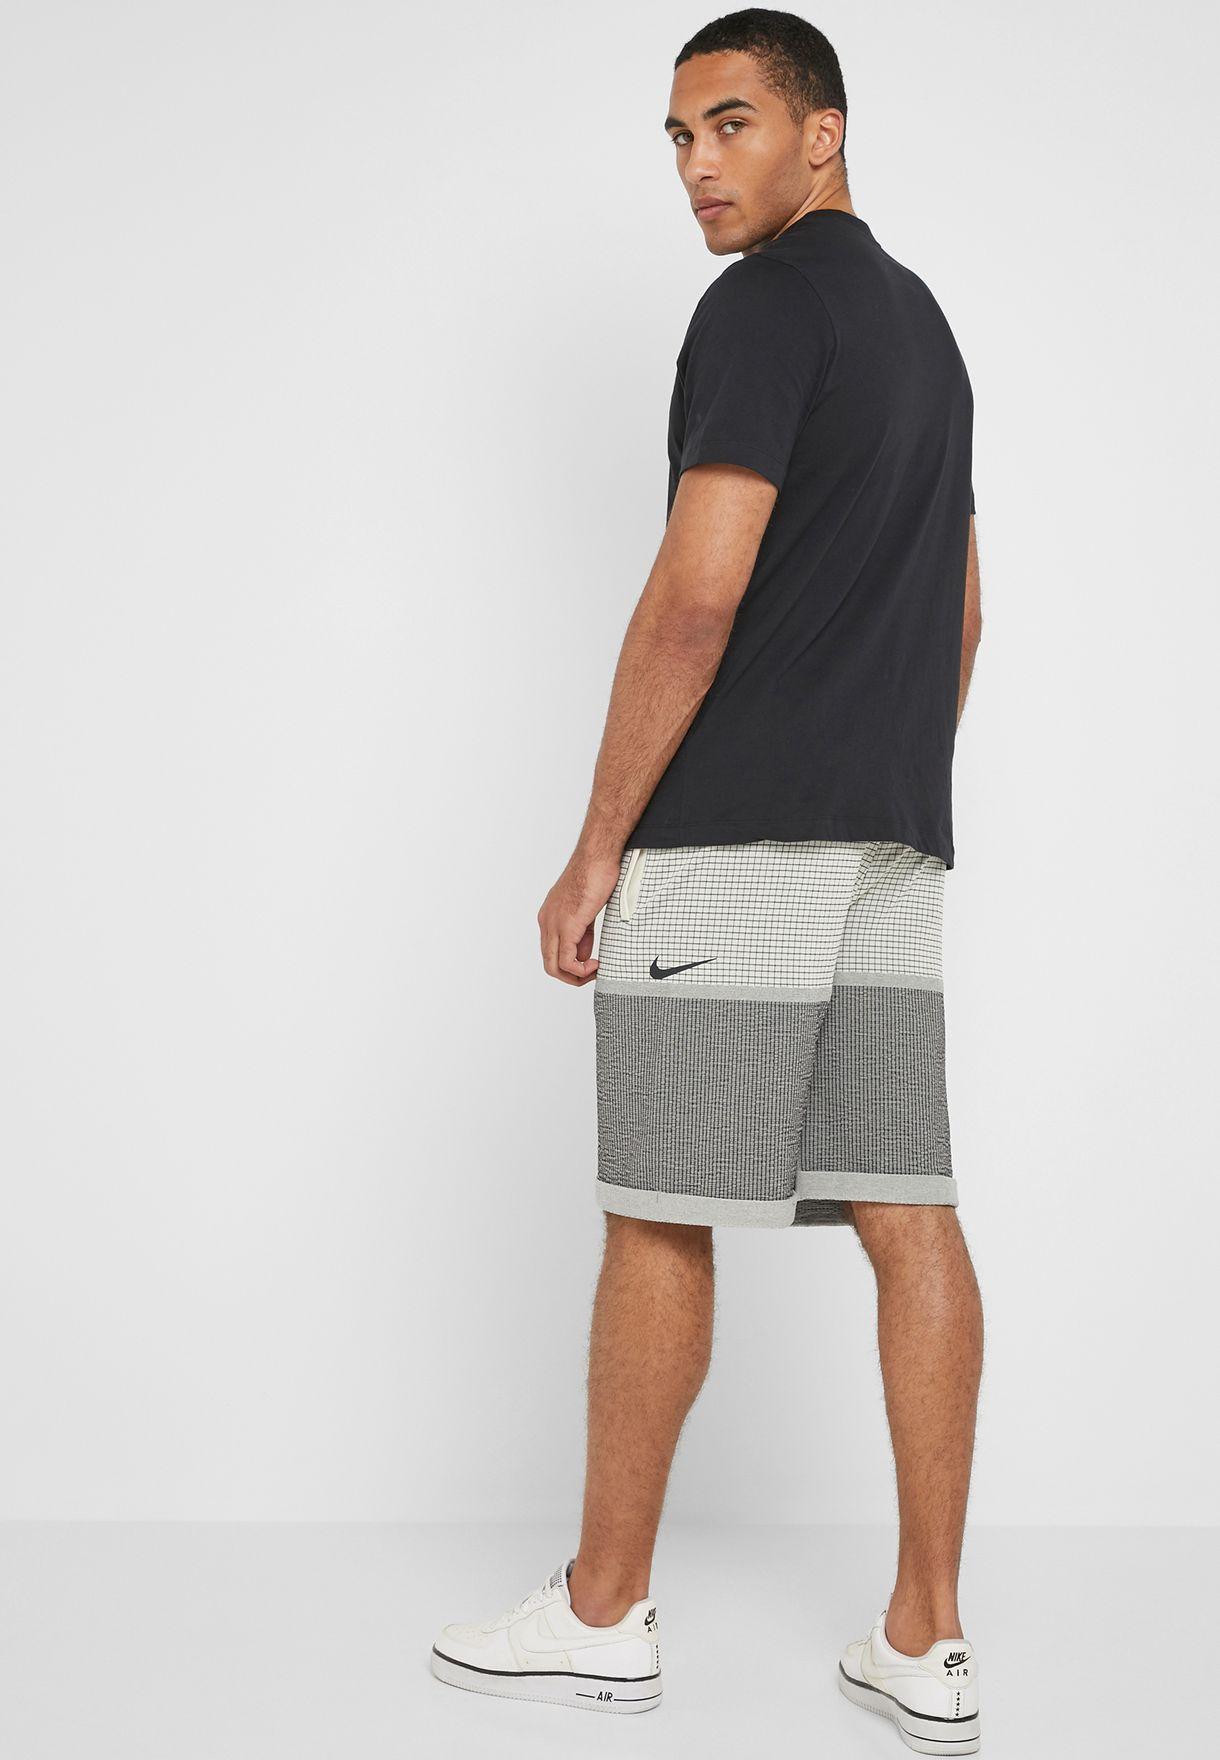 7a2c5d01ab61a Shop Nike prints Tech Pack Grid Shorts AR1587-238 for Men in Saudi ...